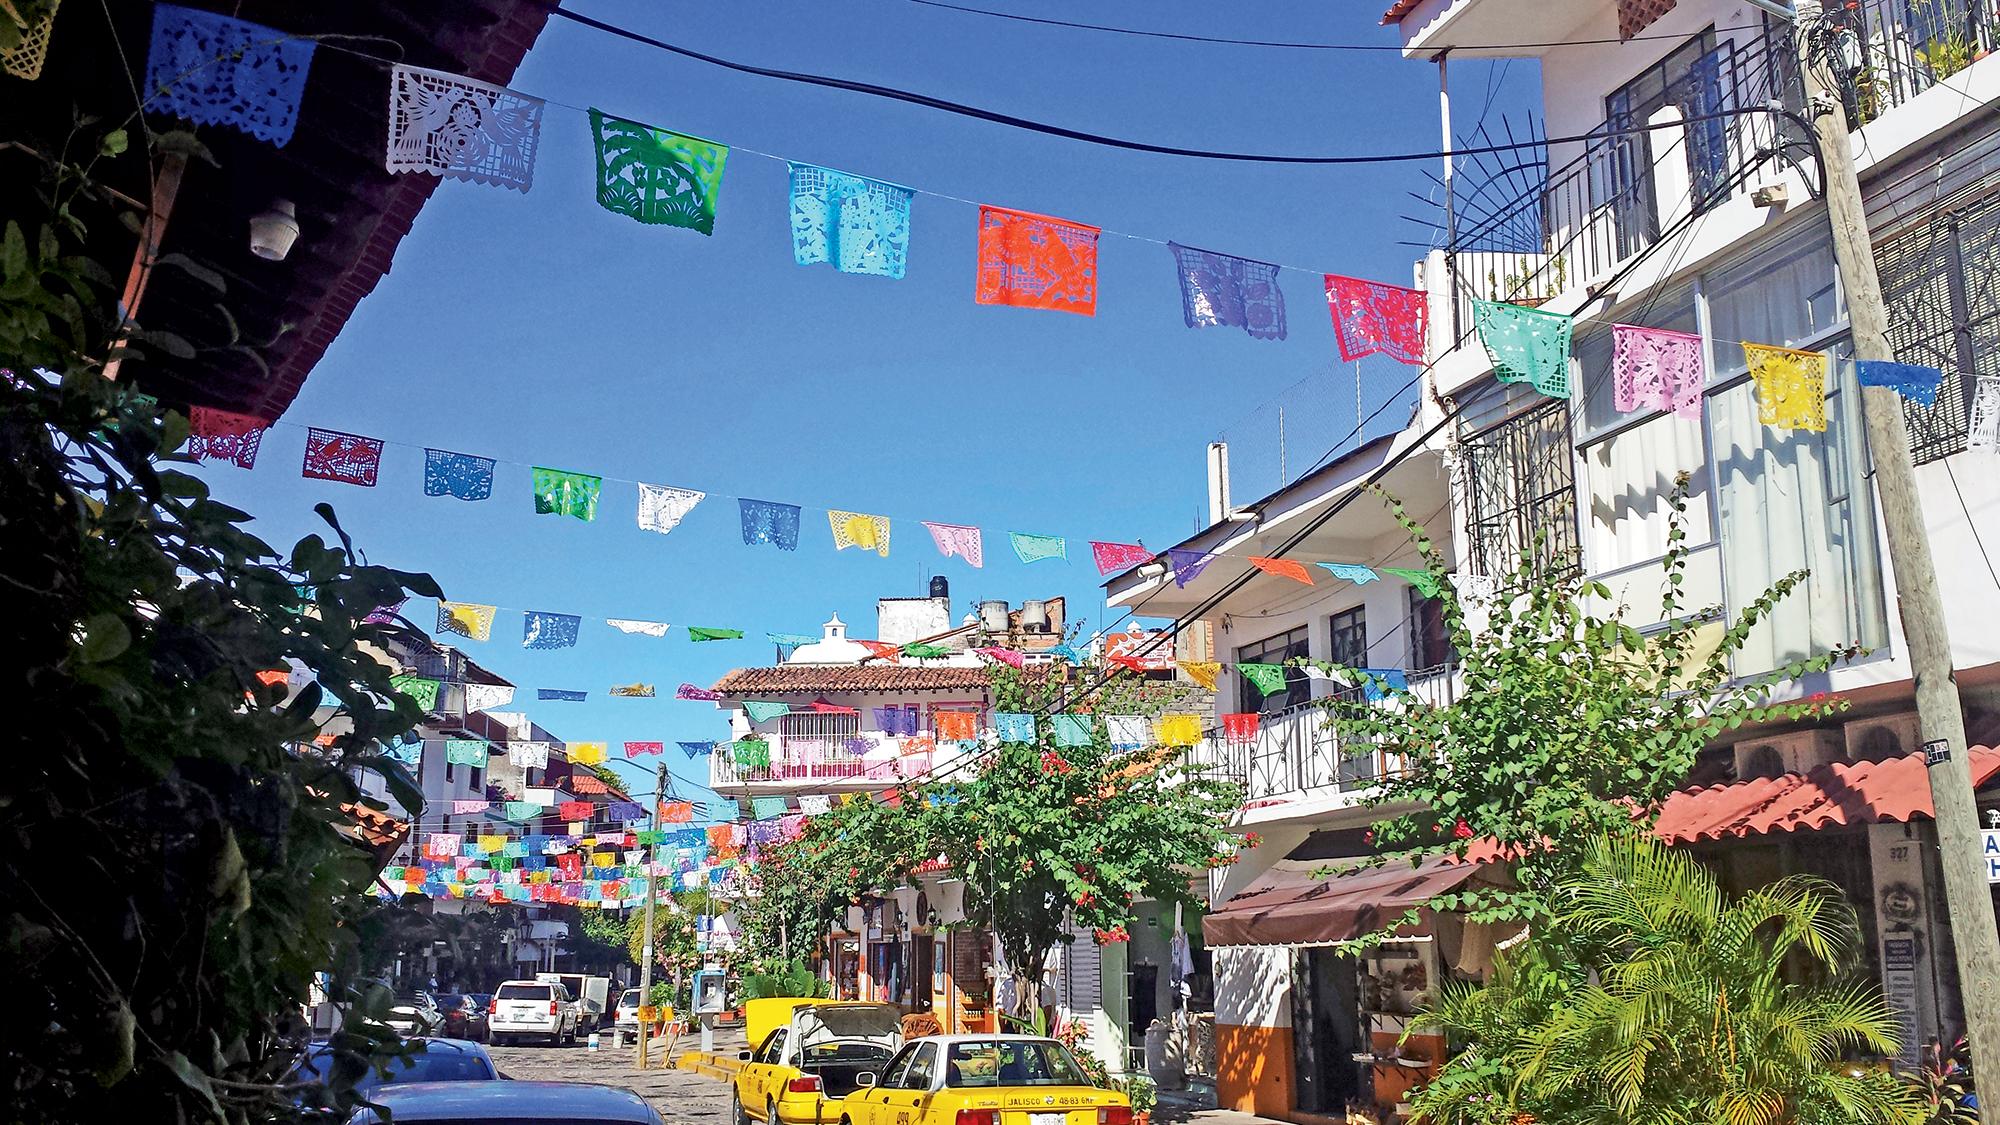 Best of Gay Puerto Vallarta - Everything Gay and Gay